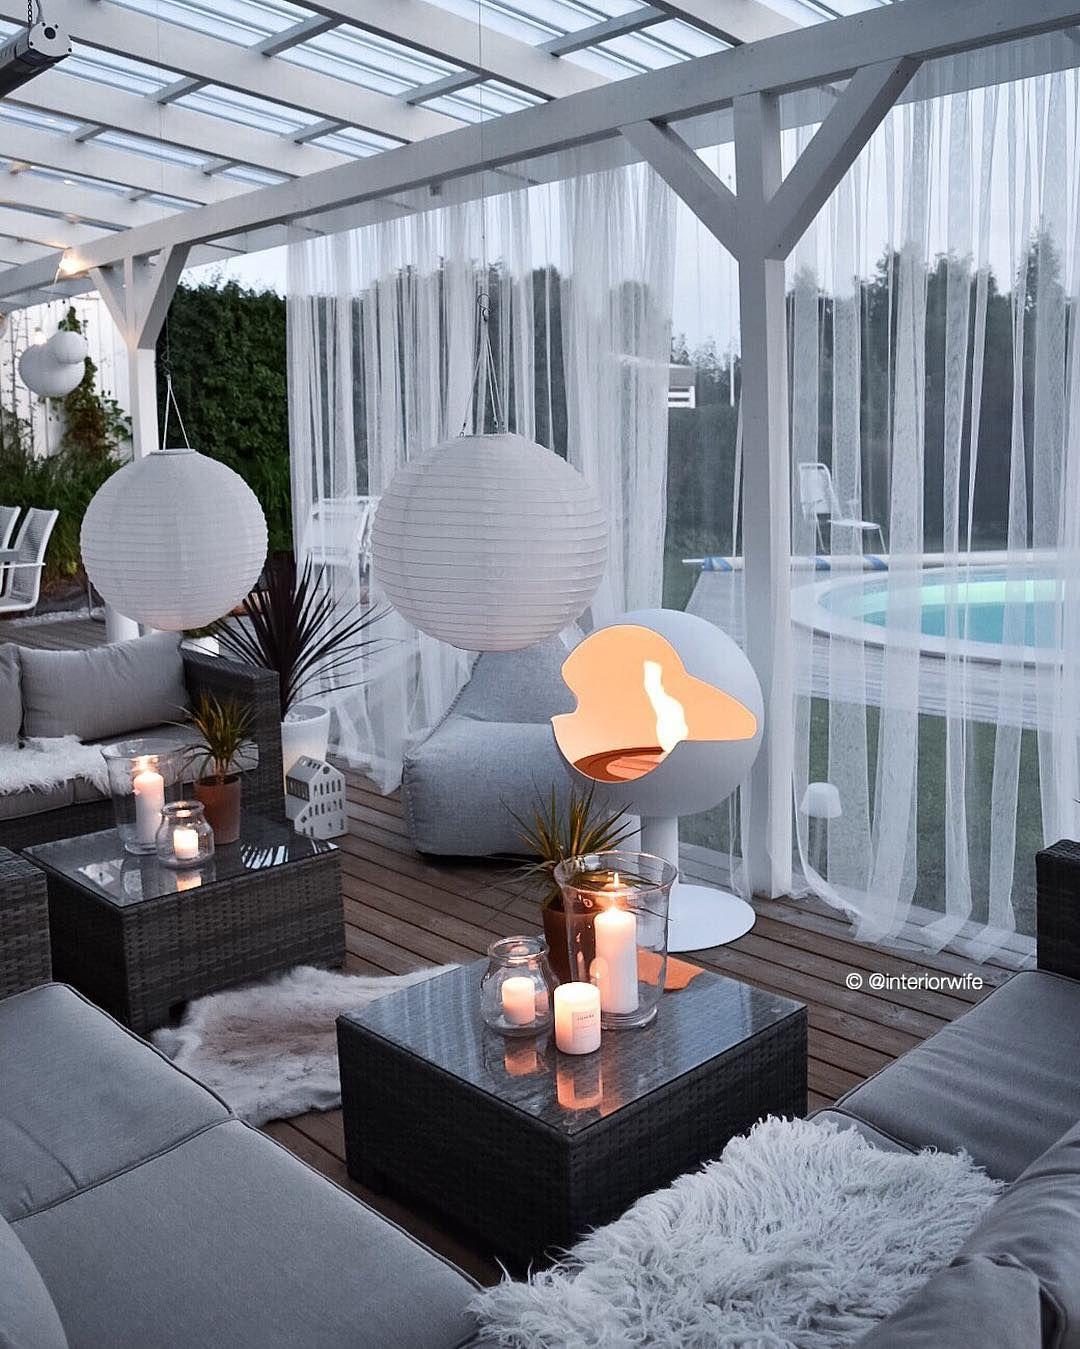 "Photo of Interior, Fashion & Garden on Instagram: ""Summer memories ✨ Your godt natt med dette forms 😴💤 Sov godt! 🙋🏼✨ """